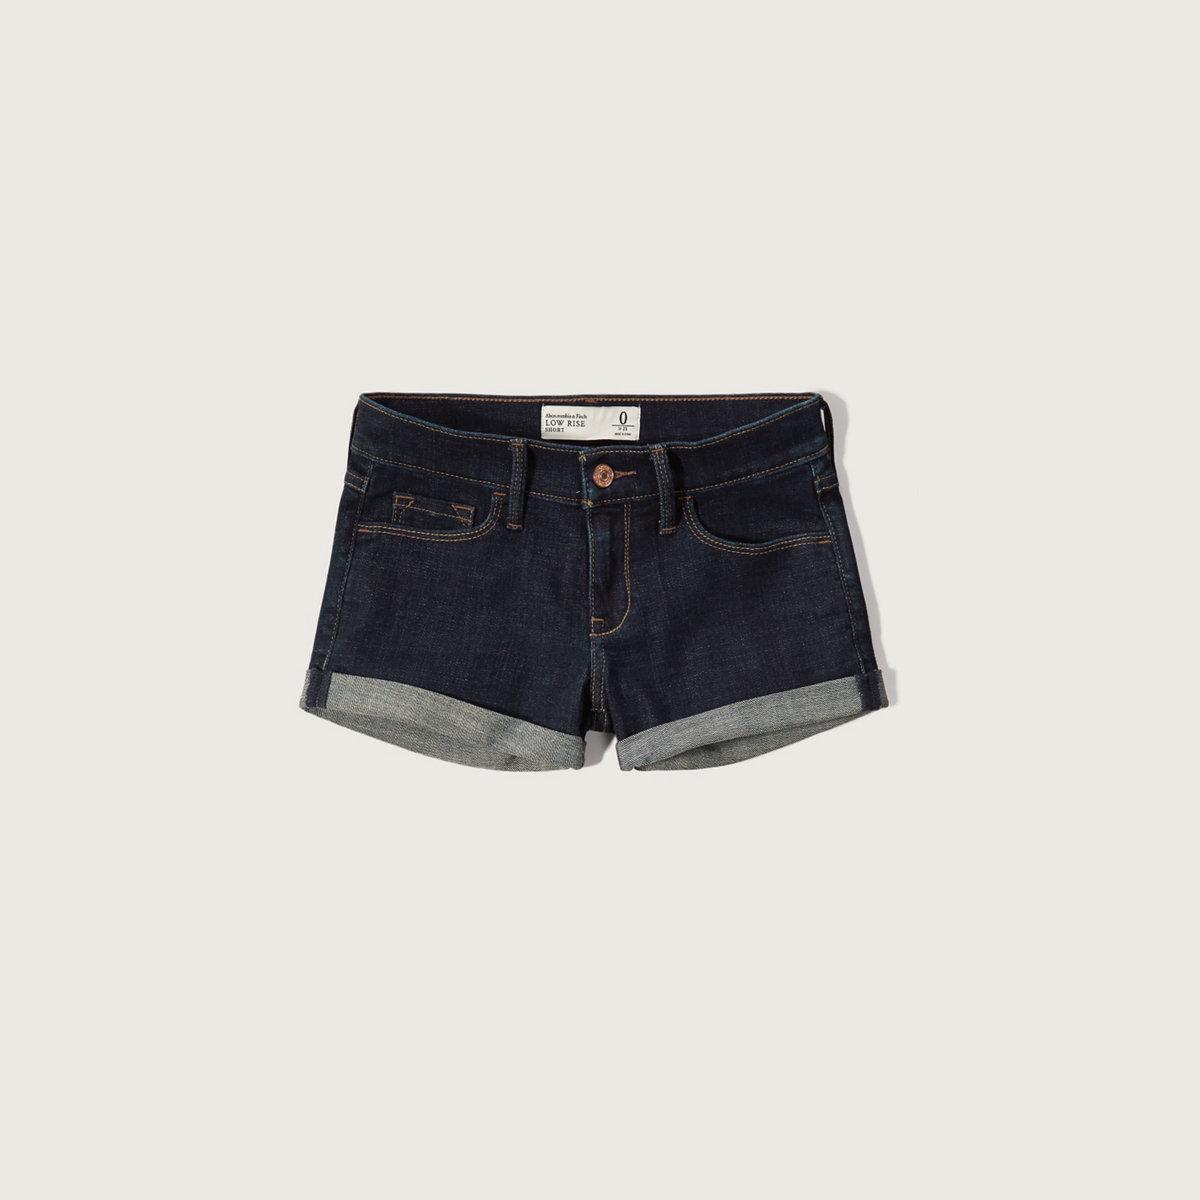 Low Rise 2 Inch Denim Shorts